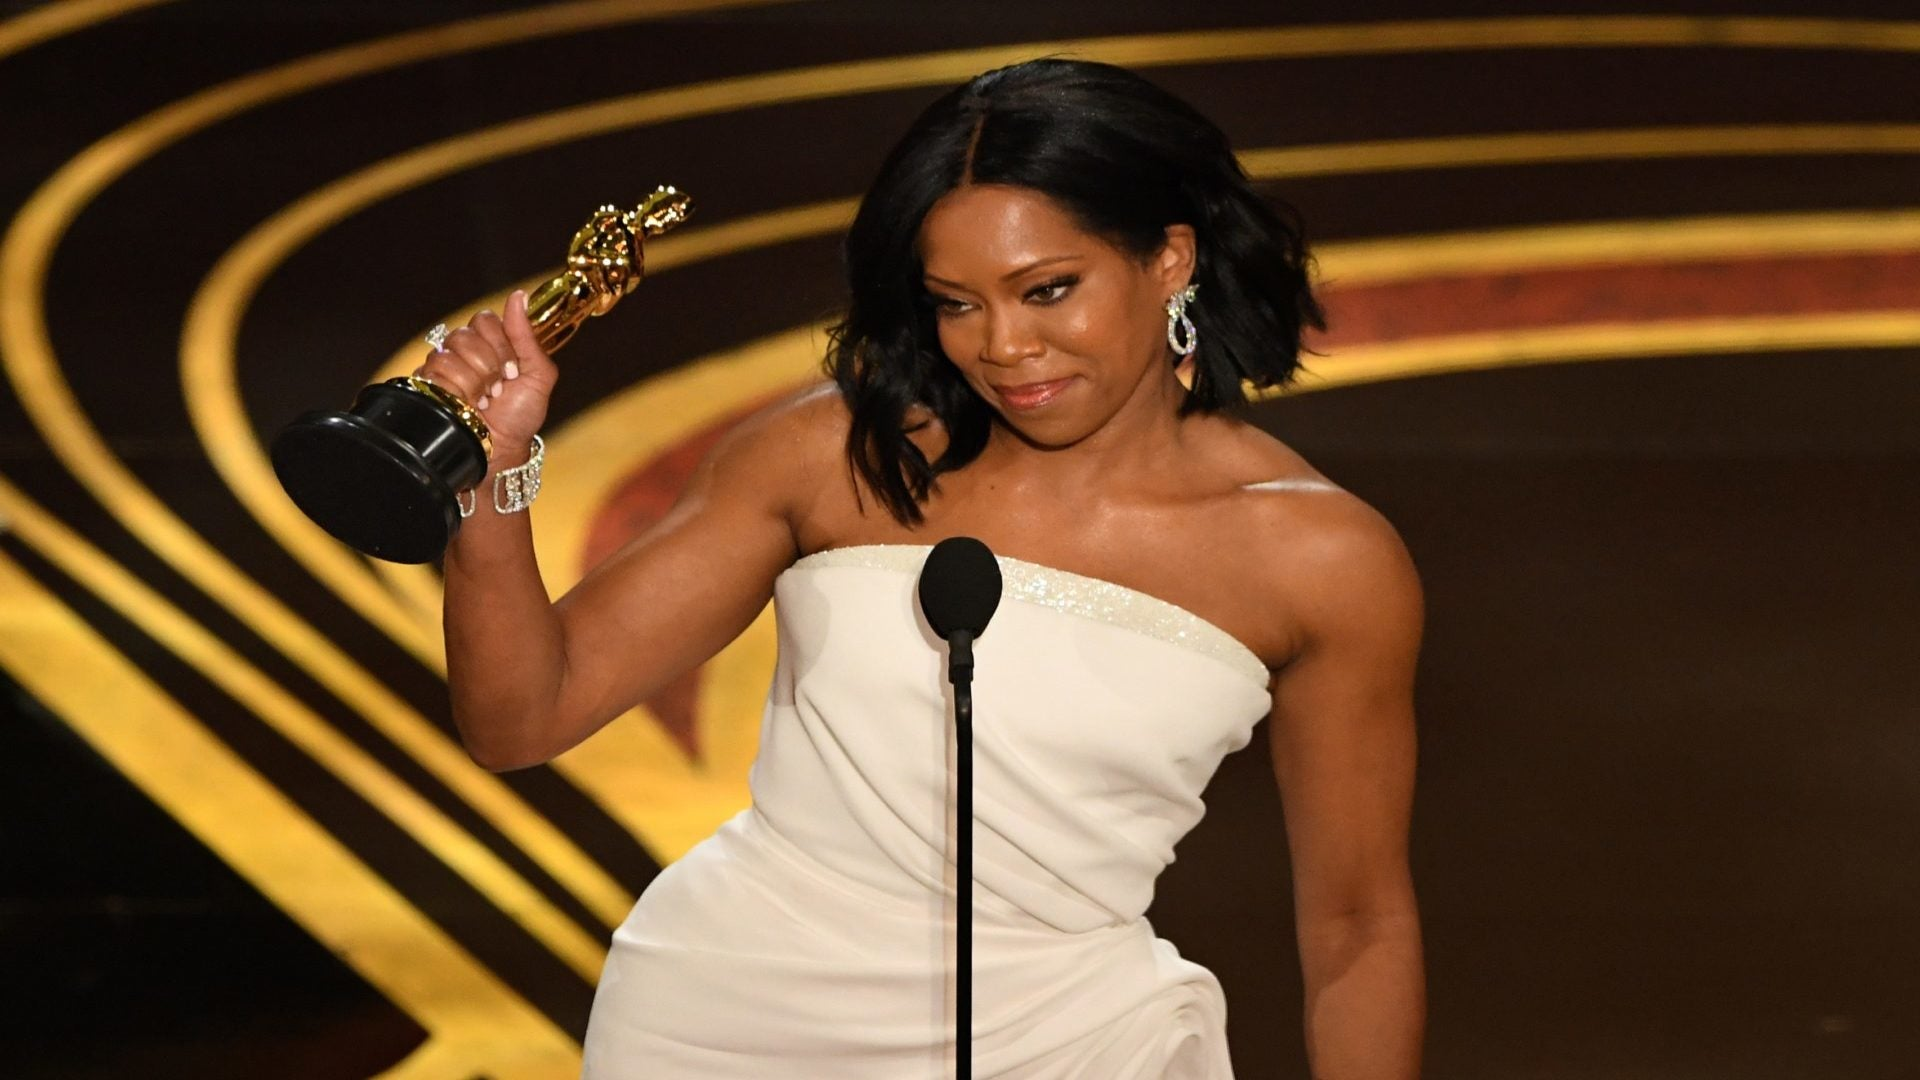 'Beale Street' Star Regina King Calls First Academy Award Win 'Surreal'